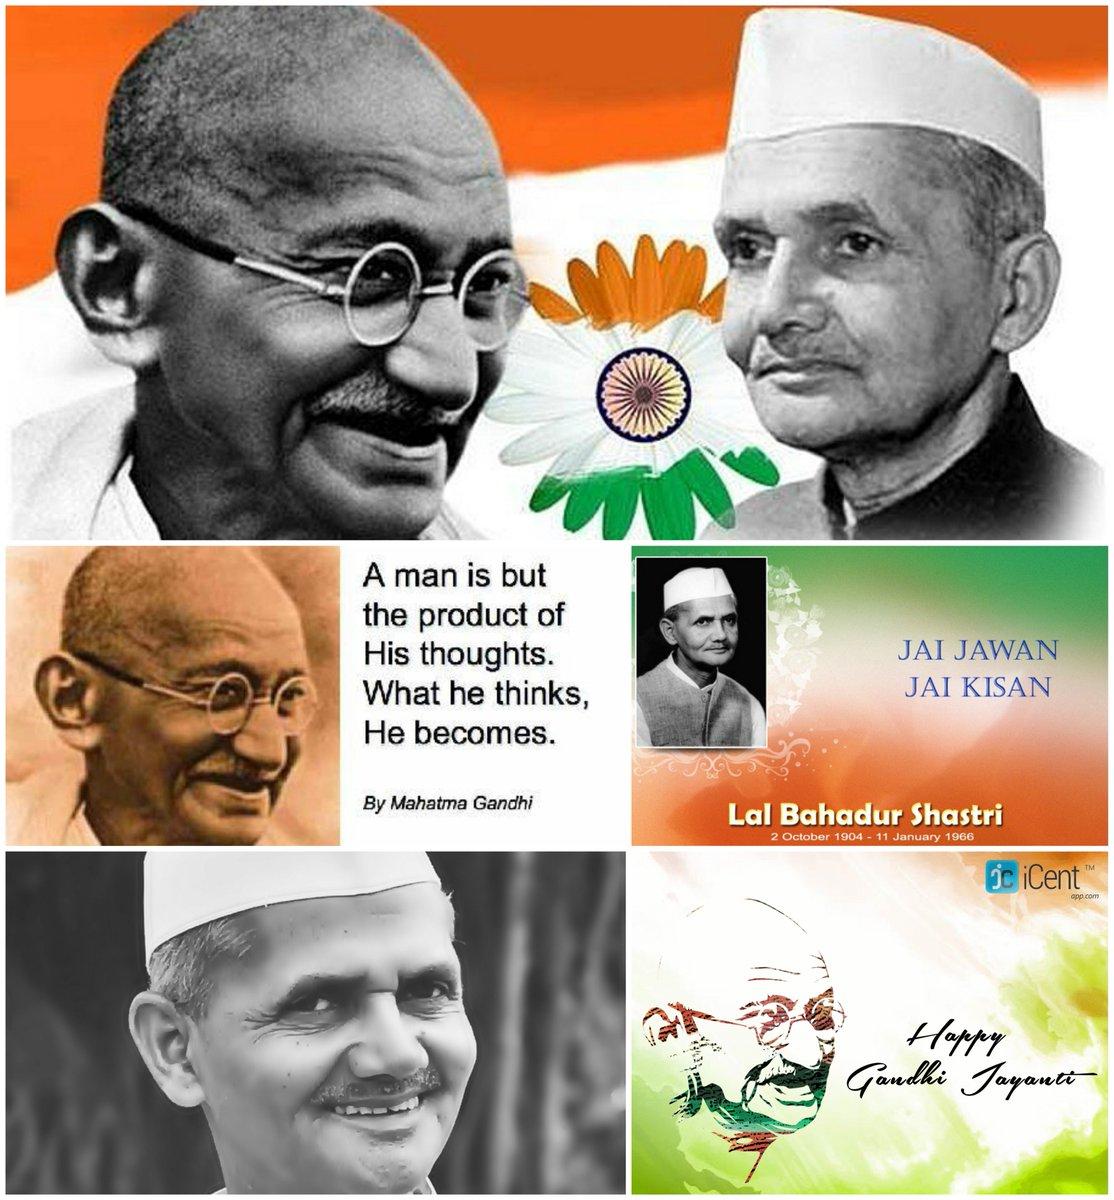 "iCent app on Twitter: ""Tributes on the birth anniversaries of Mahatma  Gandhi and Lal Bahadur Shastri ji. #GandhiJayanti #JaiJawanJaiKisan  #LalBahadurShastri… https://t.co/0PkmTwU775"""